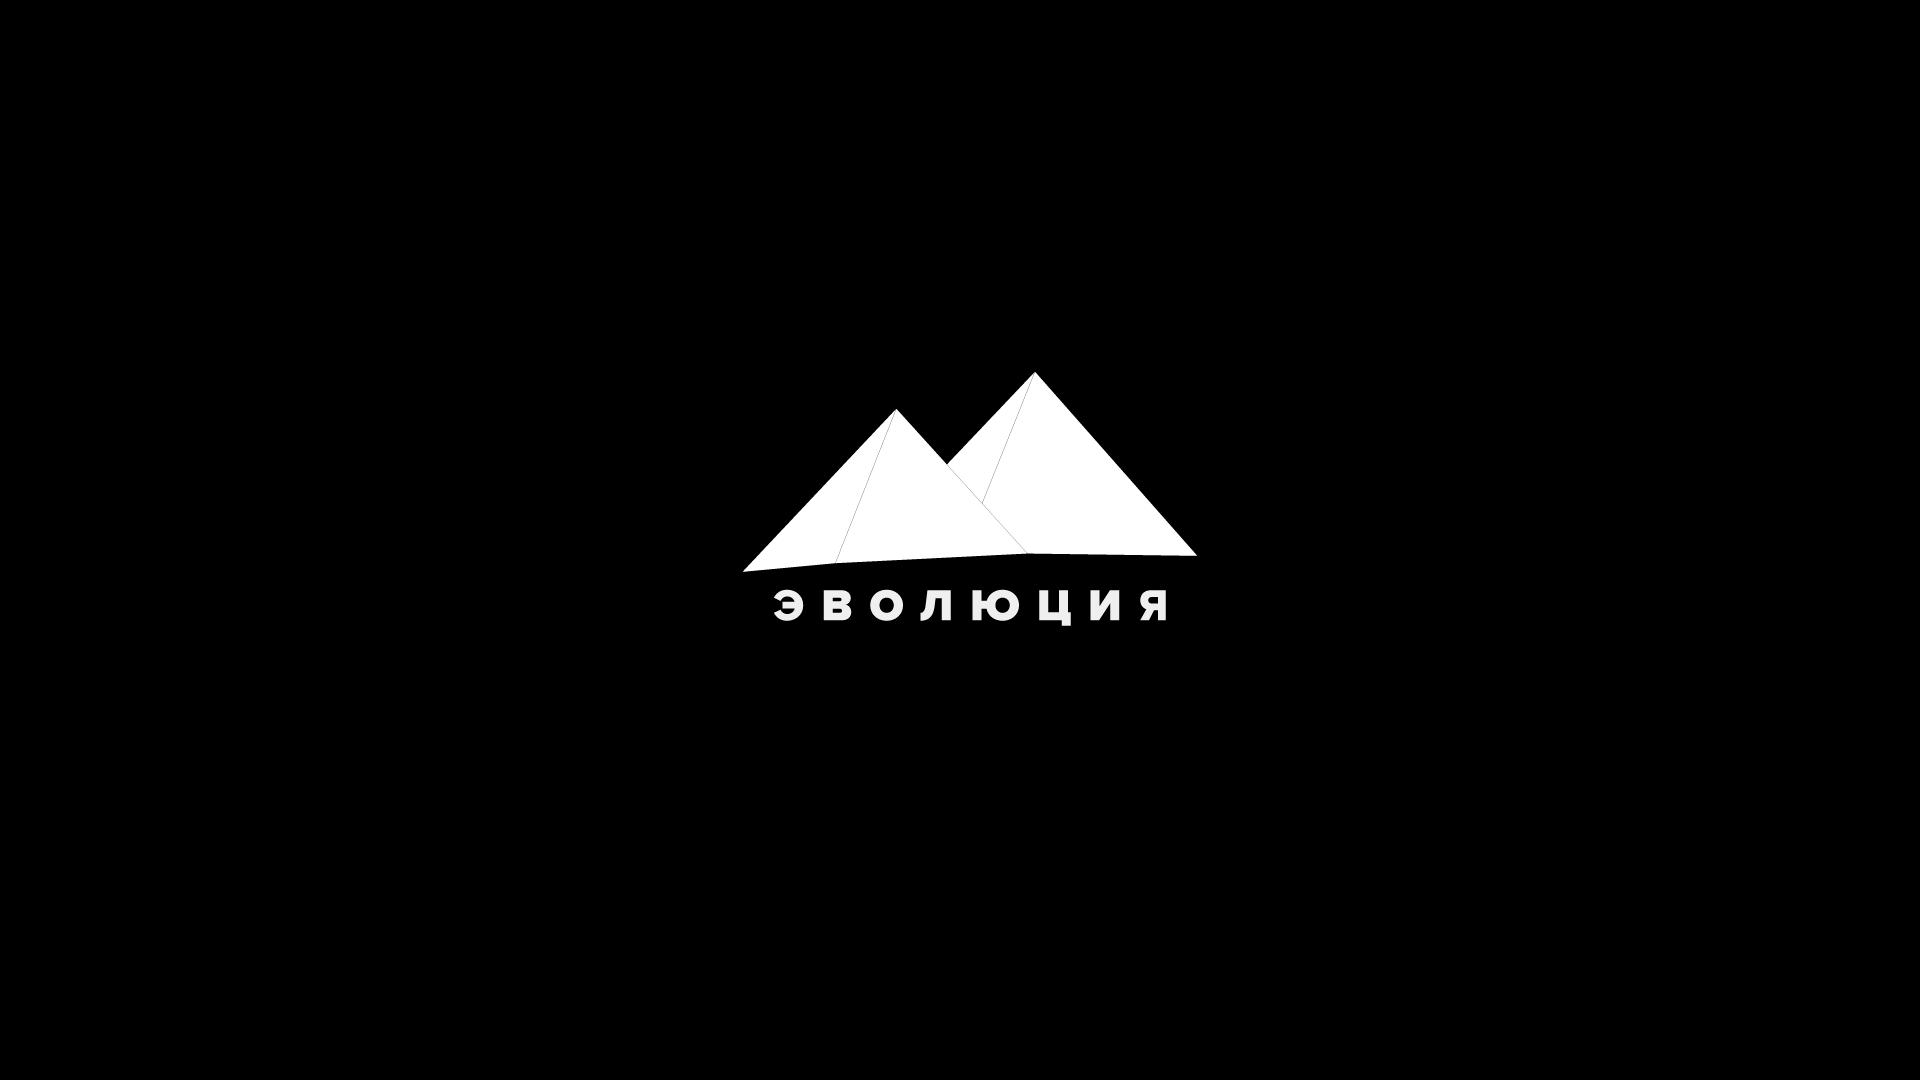 Разработать логотип для Онлайн-школы и сообщества фото f_7825bc63b9d45a0b.png